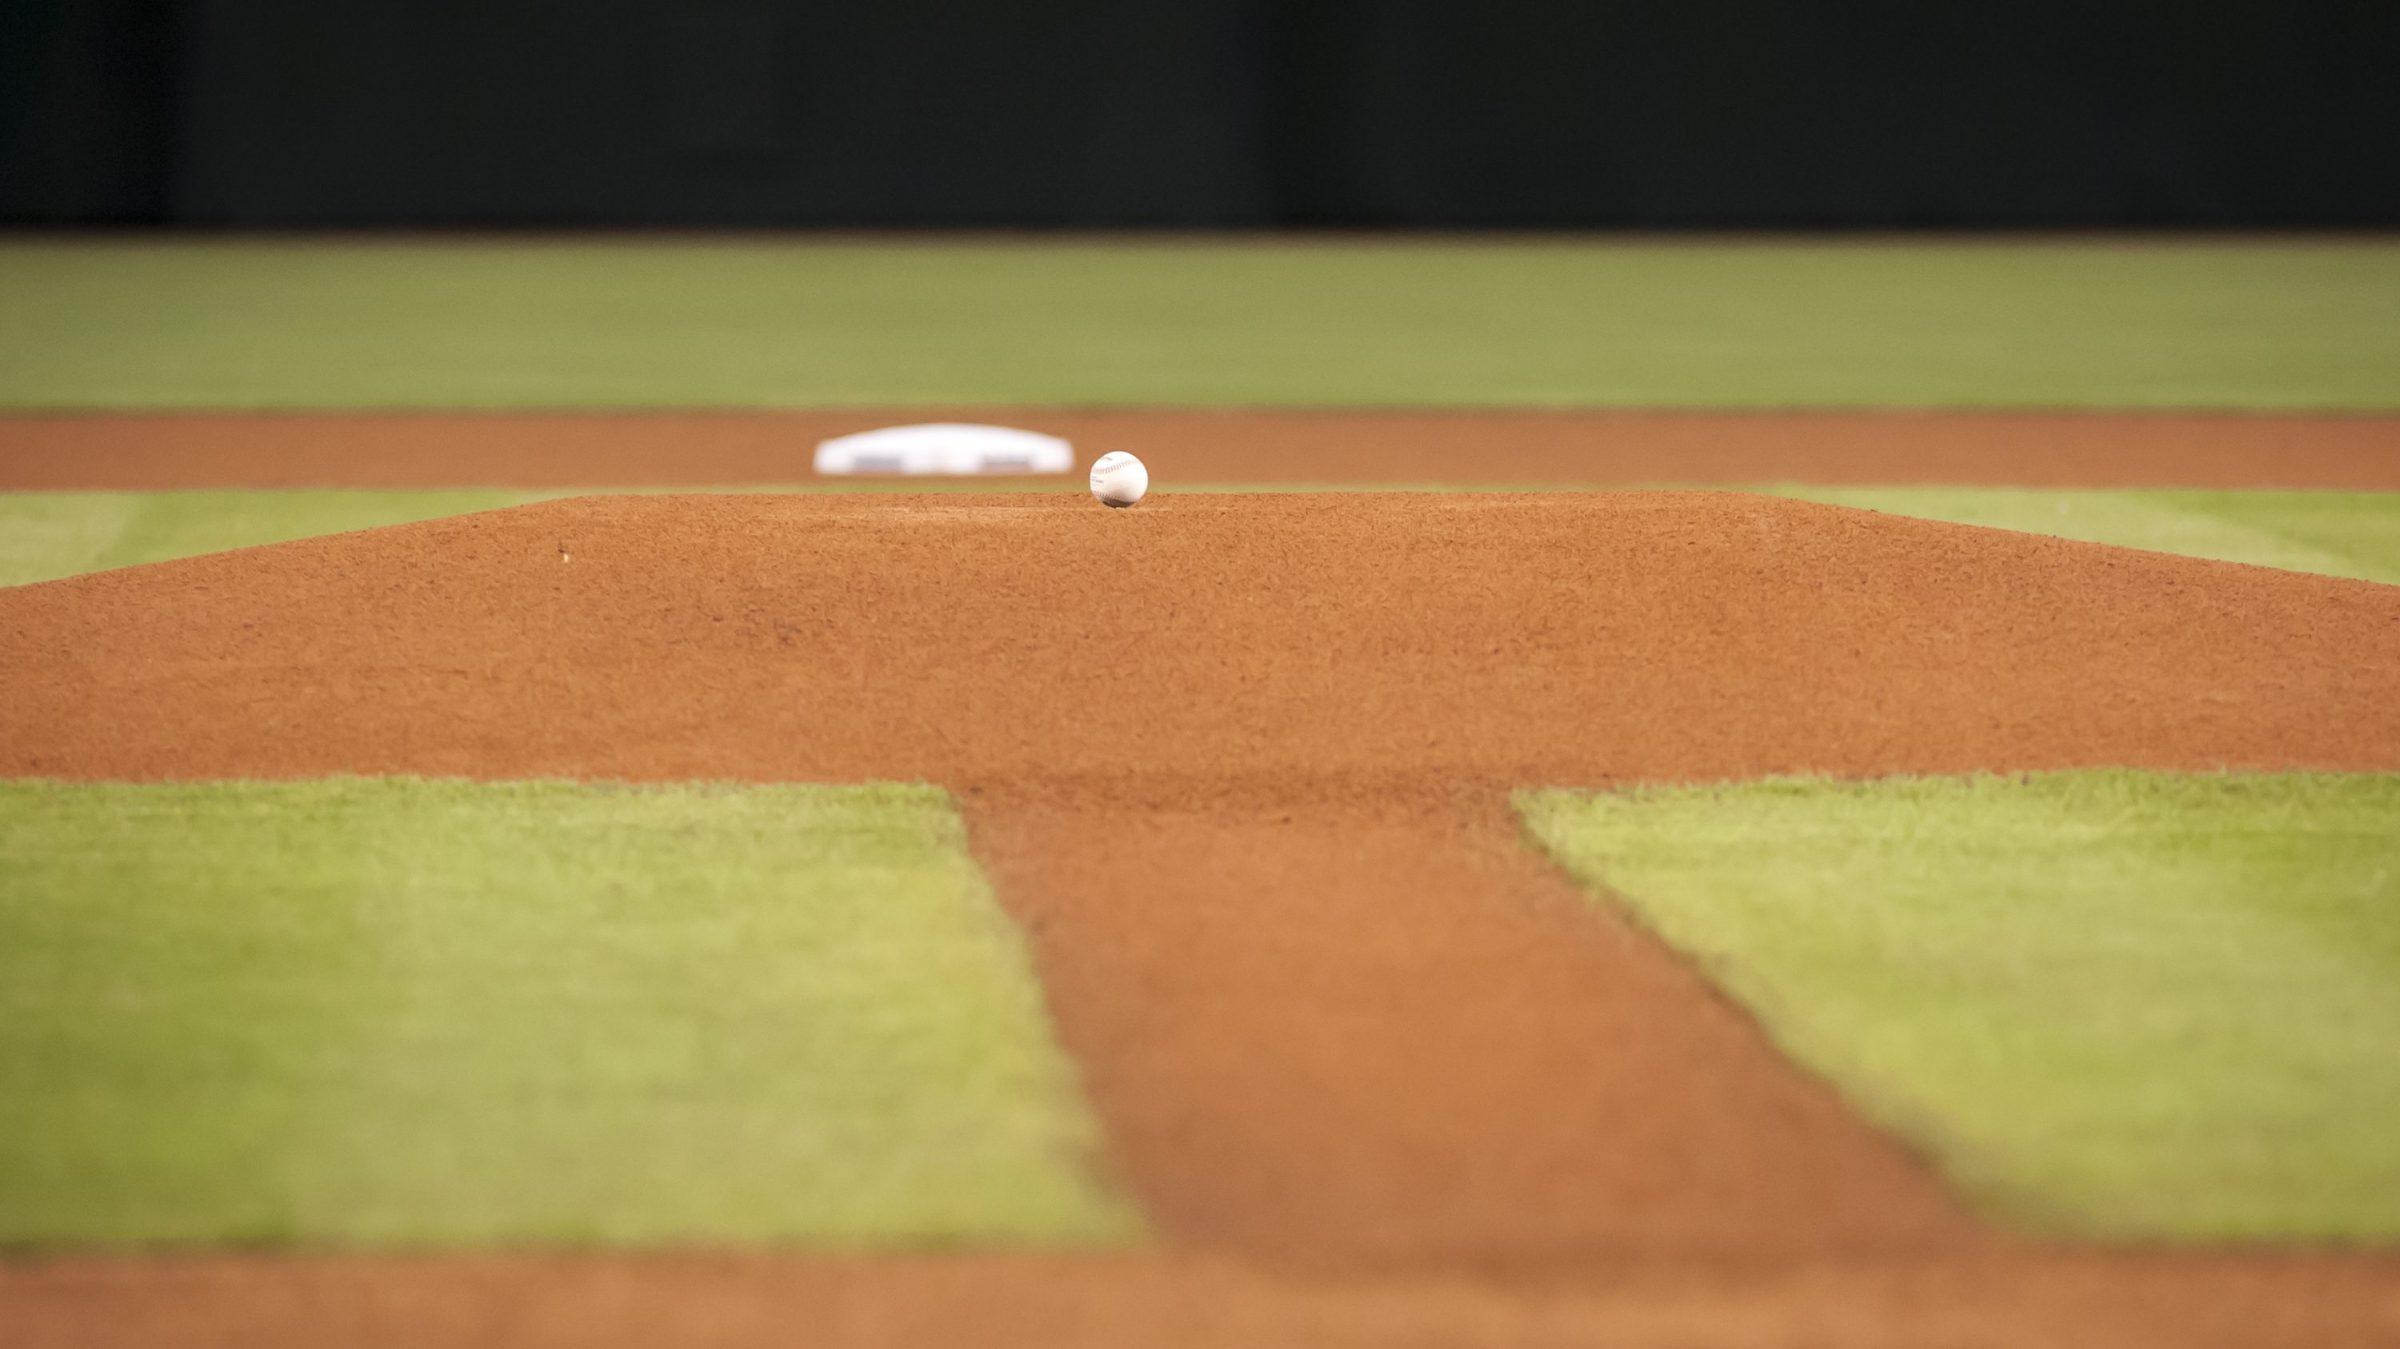 A baseball sitting on an empty baseball field.